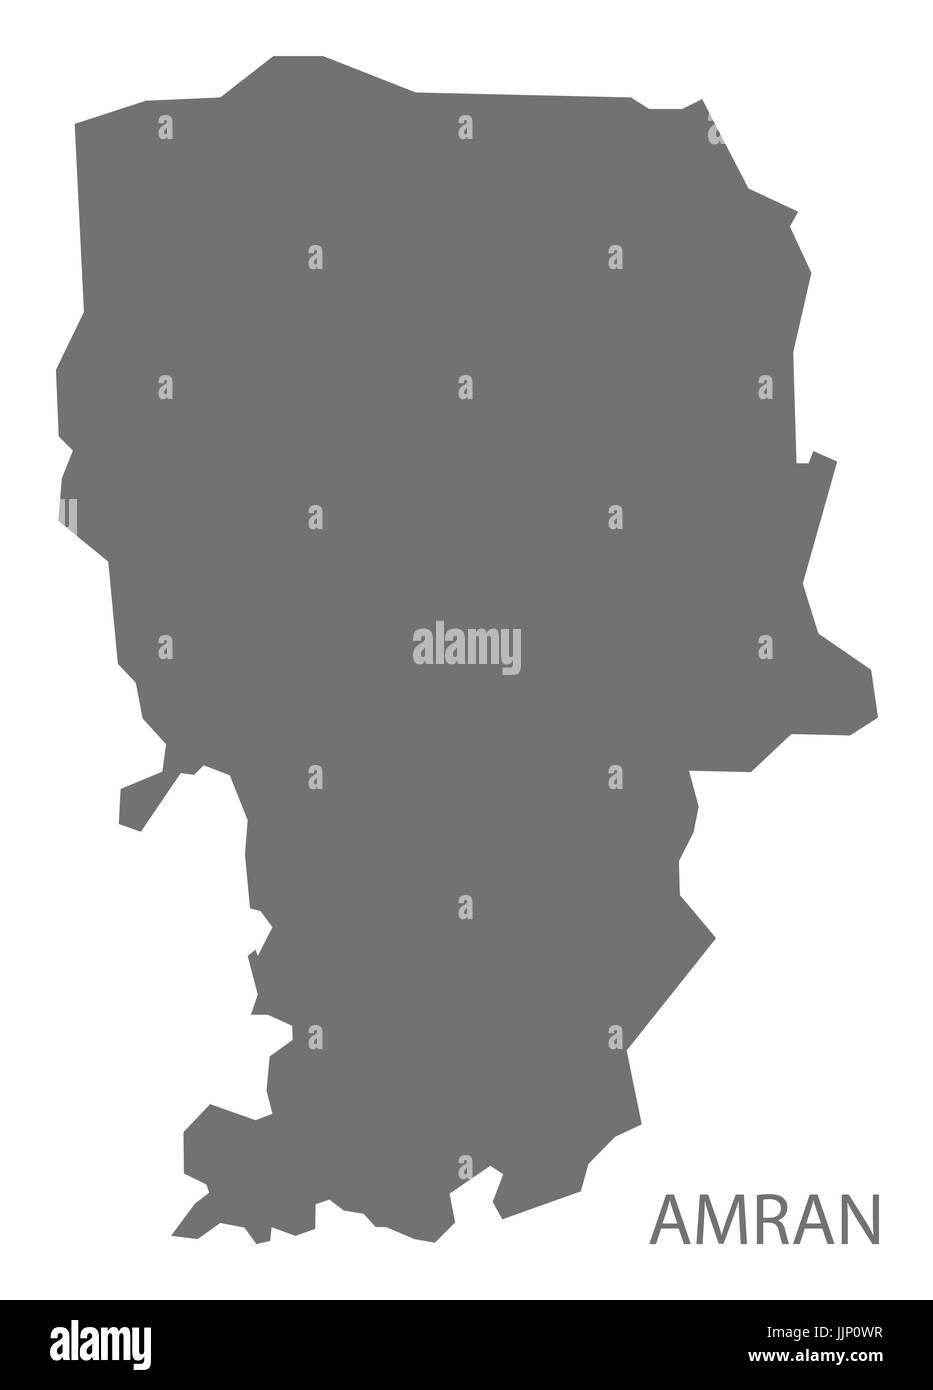 Amran Yemen governorate map grey illustration silhouette shape - Stock Vector